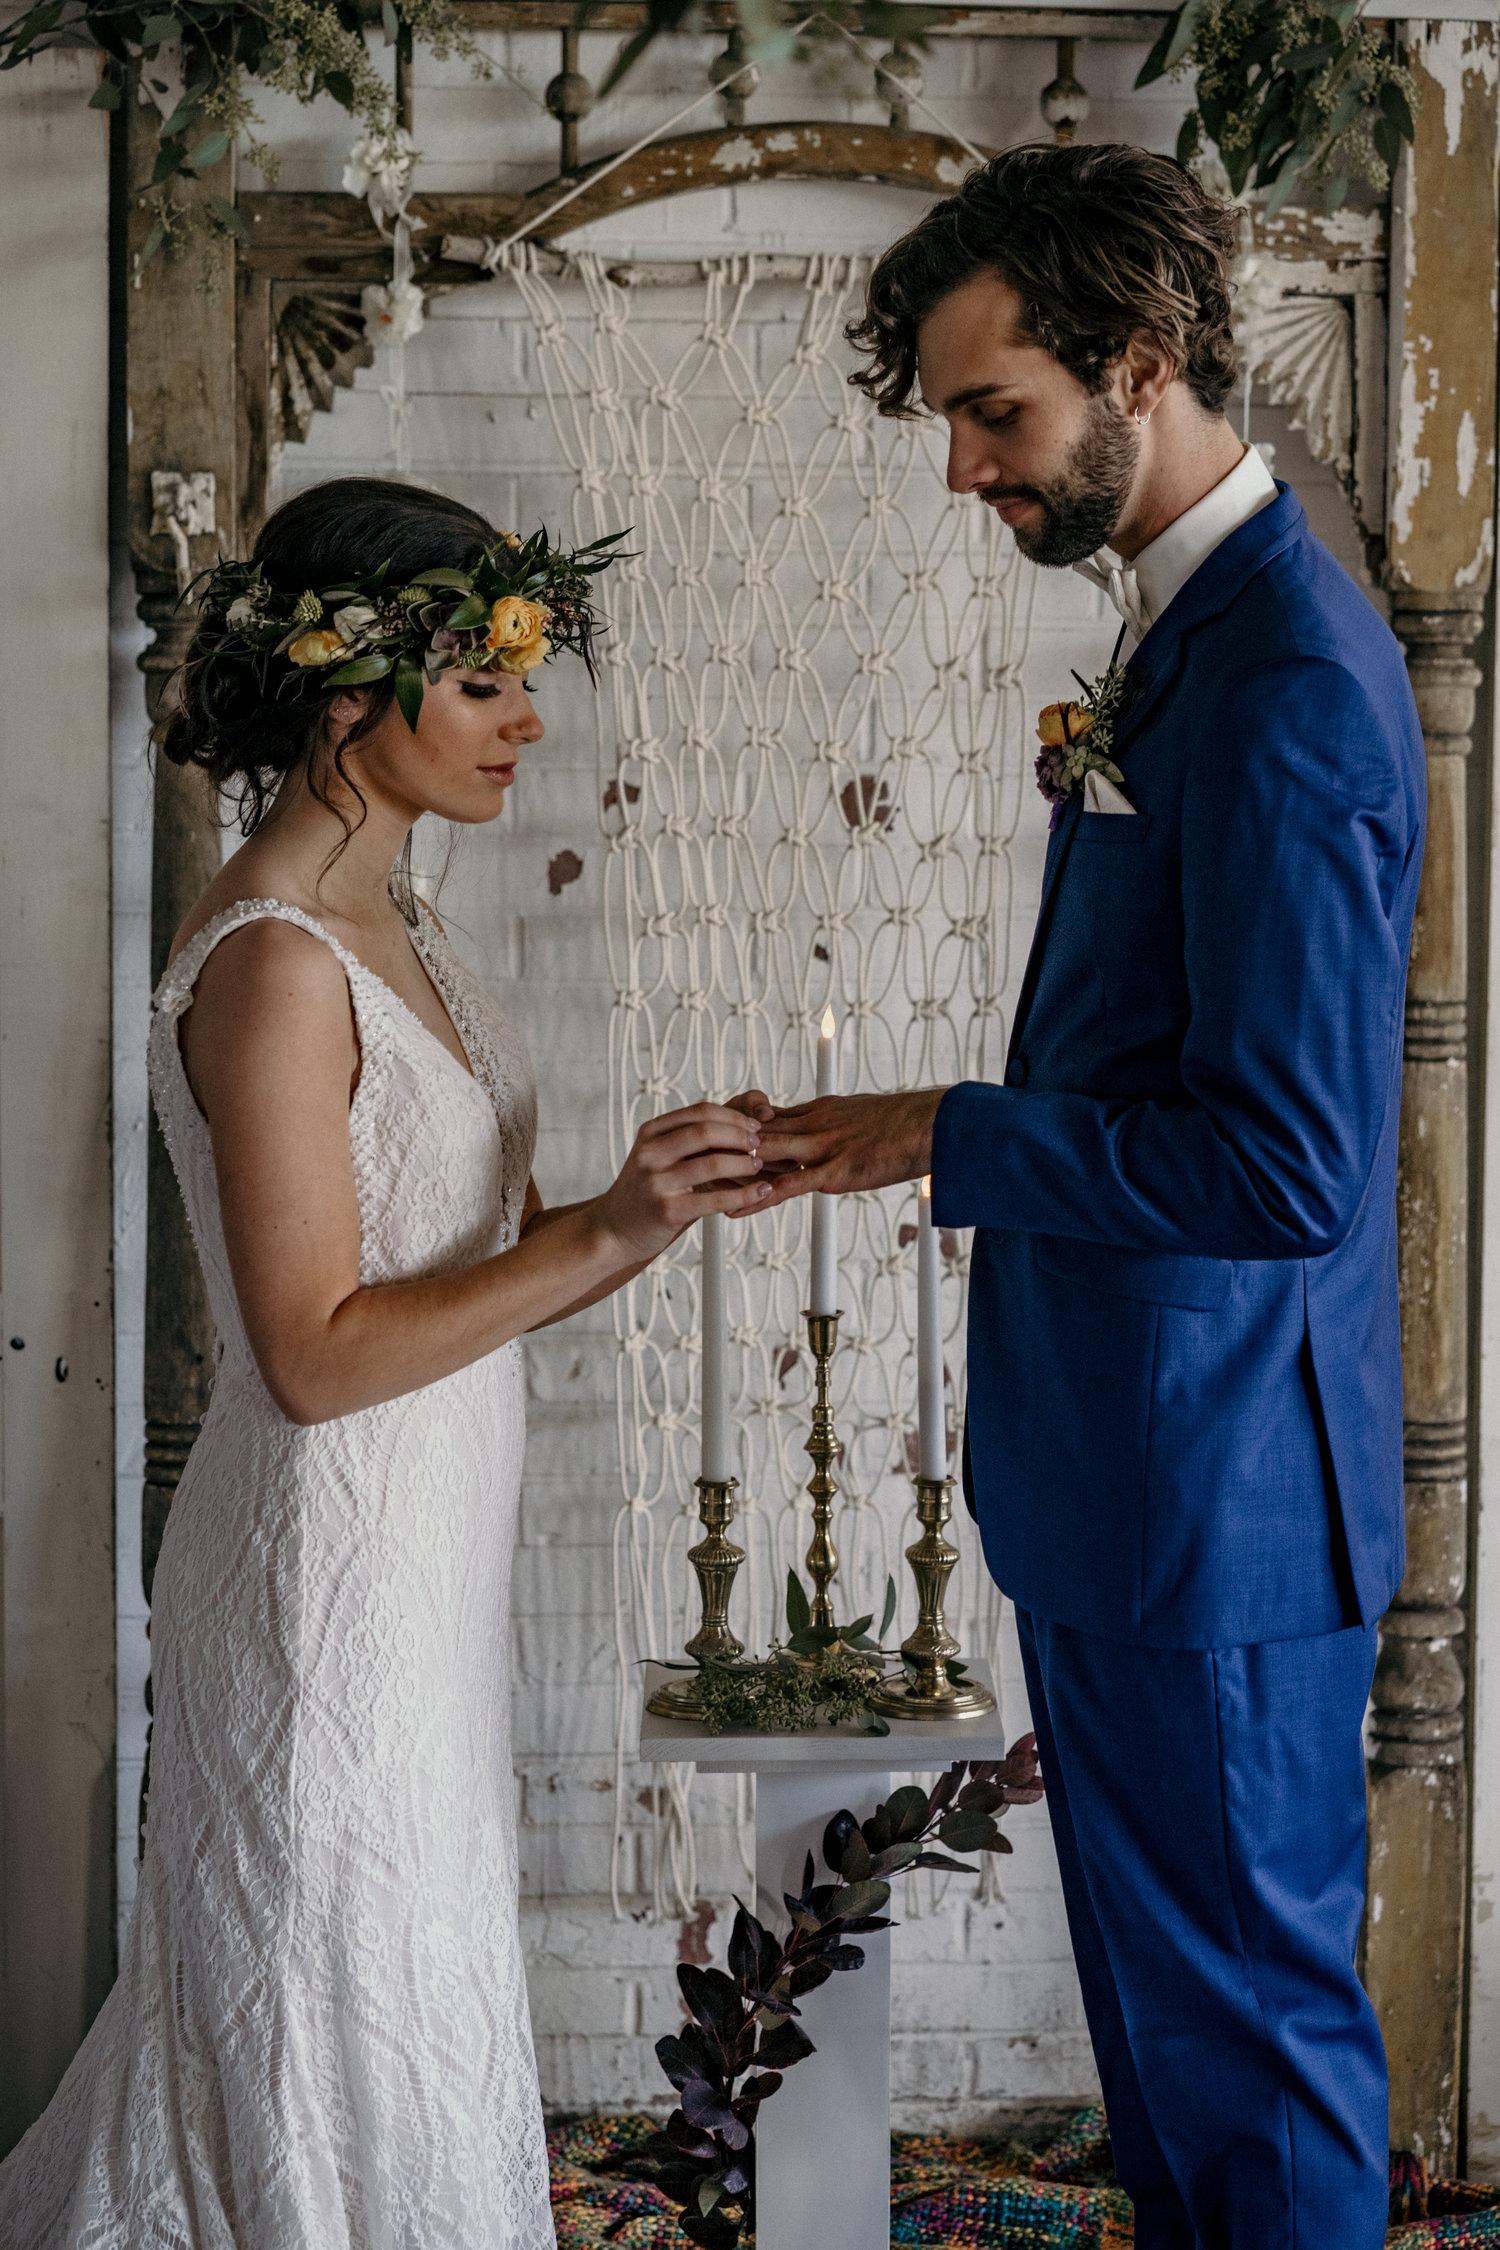 Boho-weddings-iowa-des moines-wedding-florist-desmoines-wedding-flowers-wedding-flower-crowns